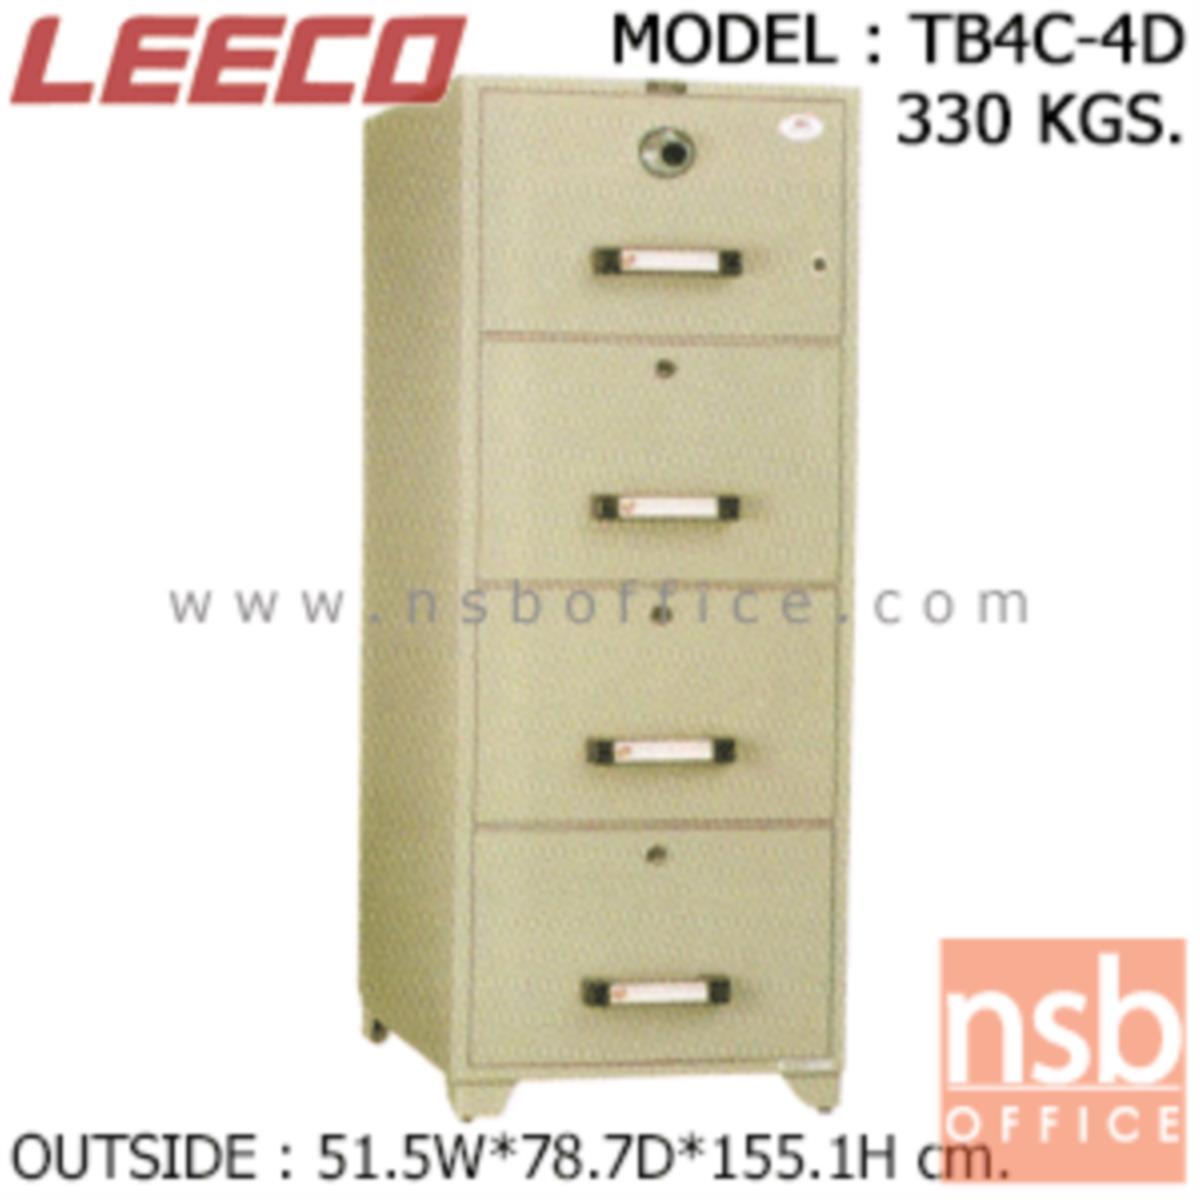 F02A016:ตู้เซฟ 4 ลิ้นชักแฟ้มแขวน 330 กก. ลีโก้ รุ่น LEECO-TB4C-4D มี 4 กุญแจ 1 รหัส (เปลี่ยนรหัสไม่ได้)